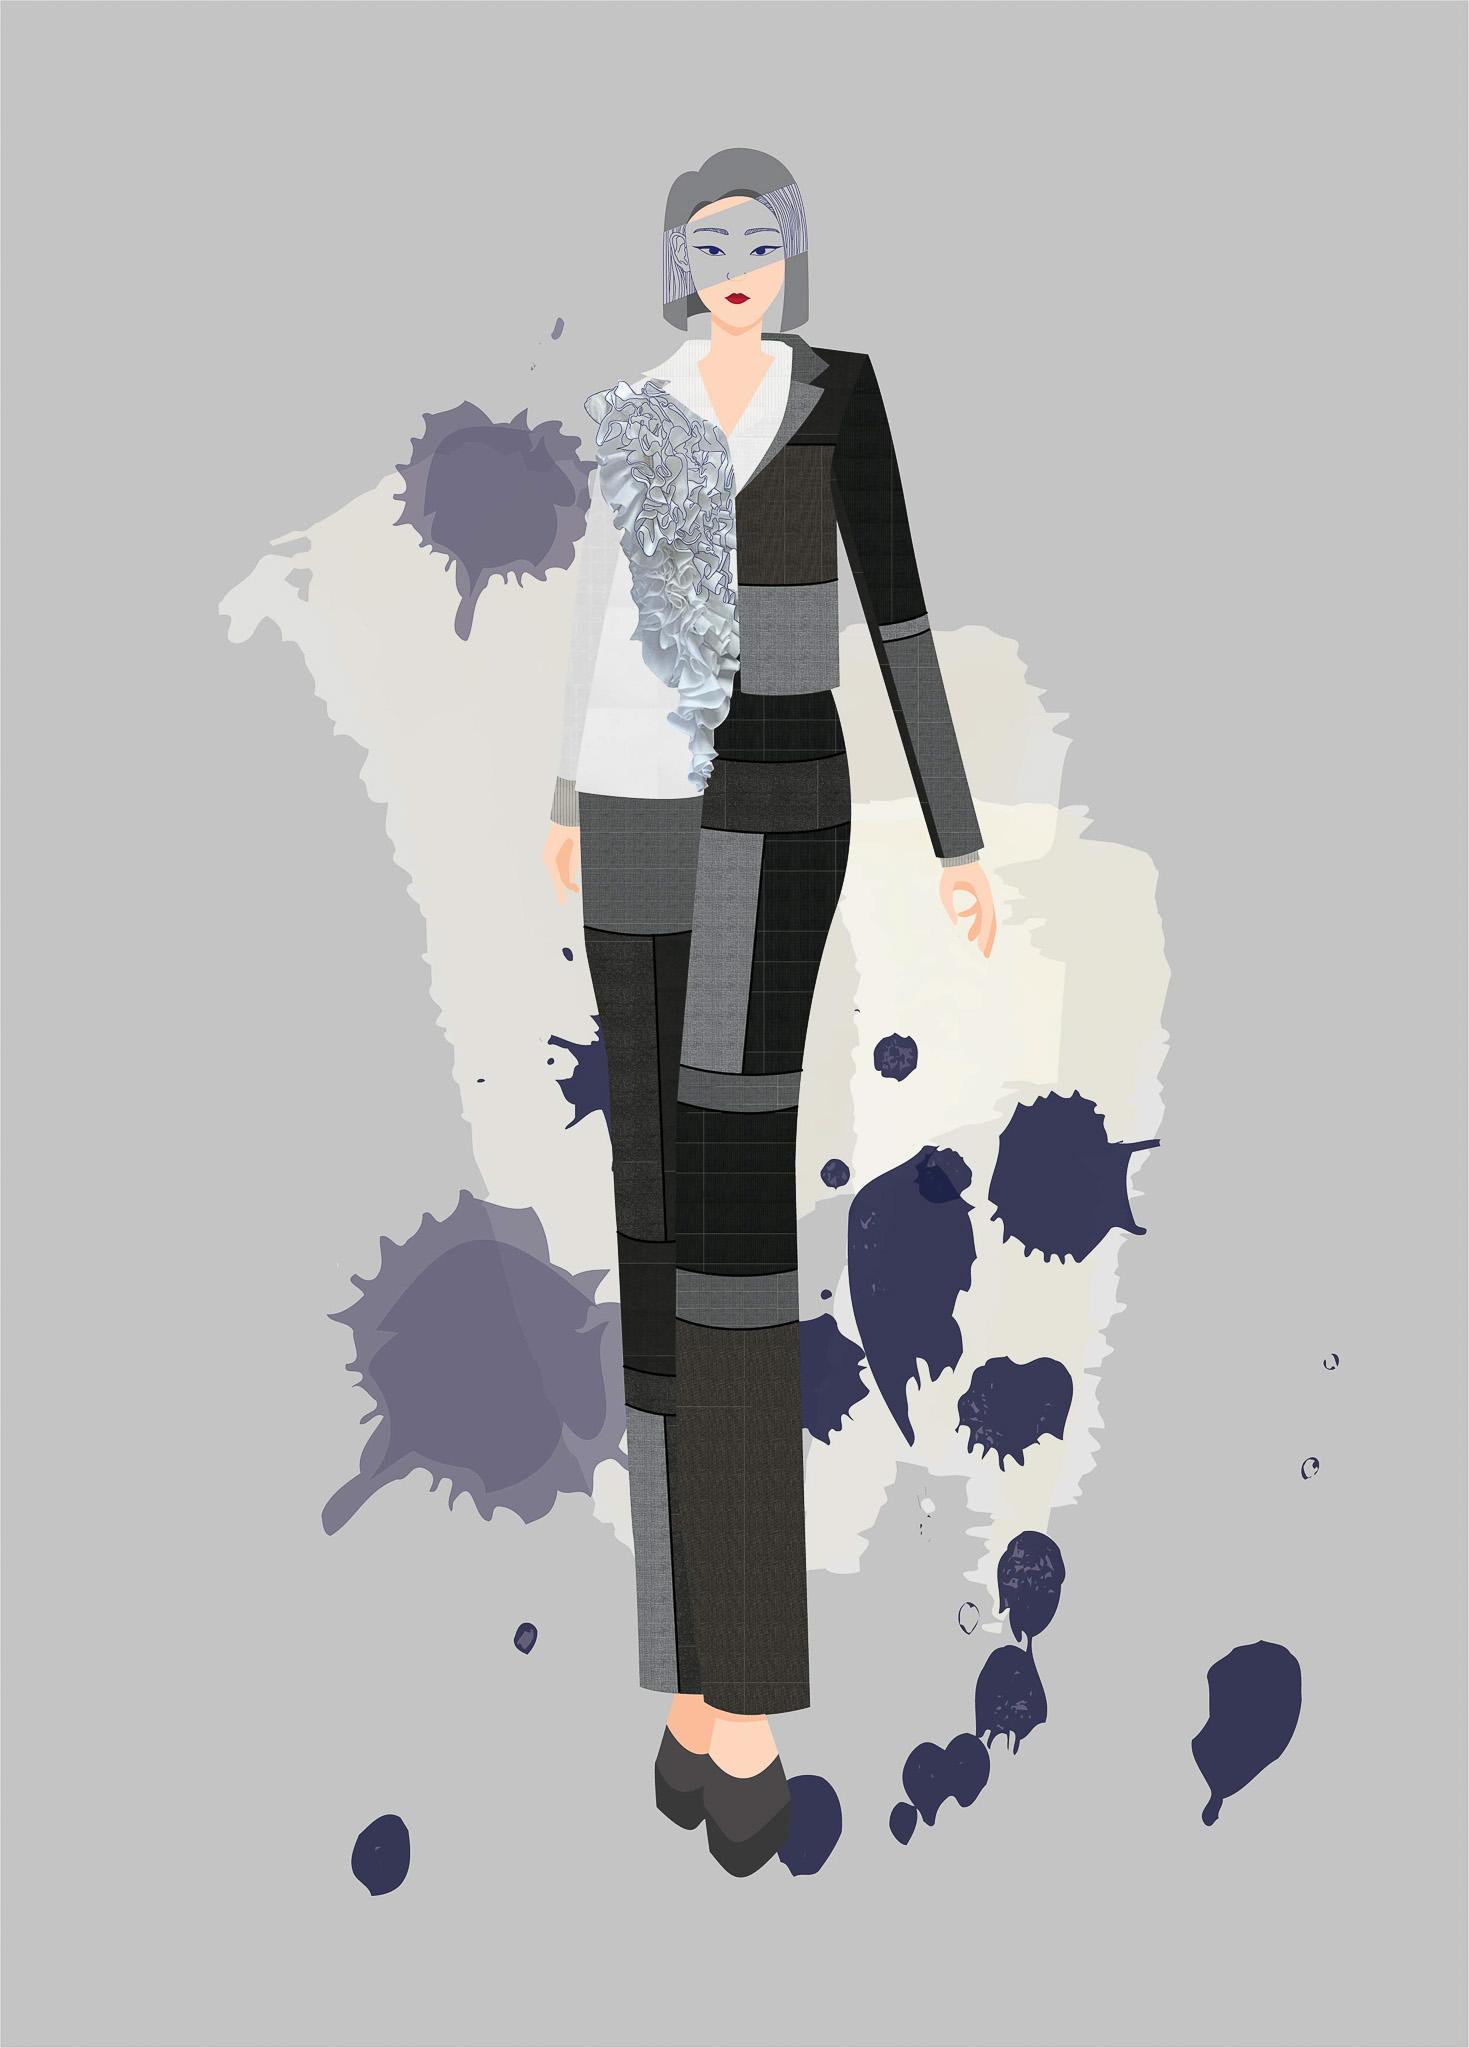 Dresscode - Business Informal: Annabelle Wong, Alumni, Singapur, Temasek Polytechnic (Create your Revolution)